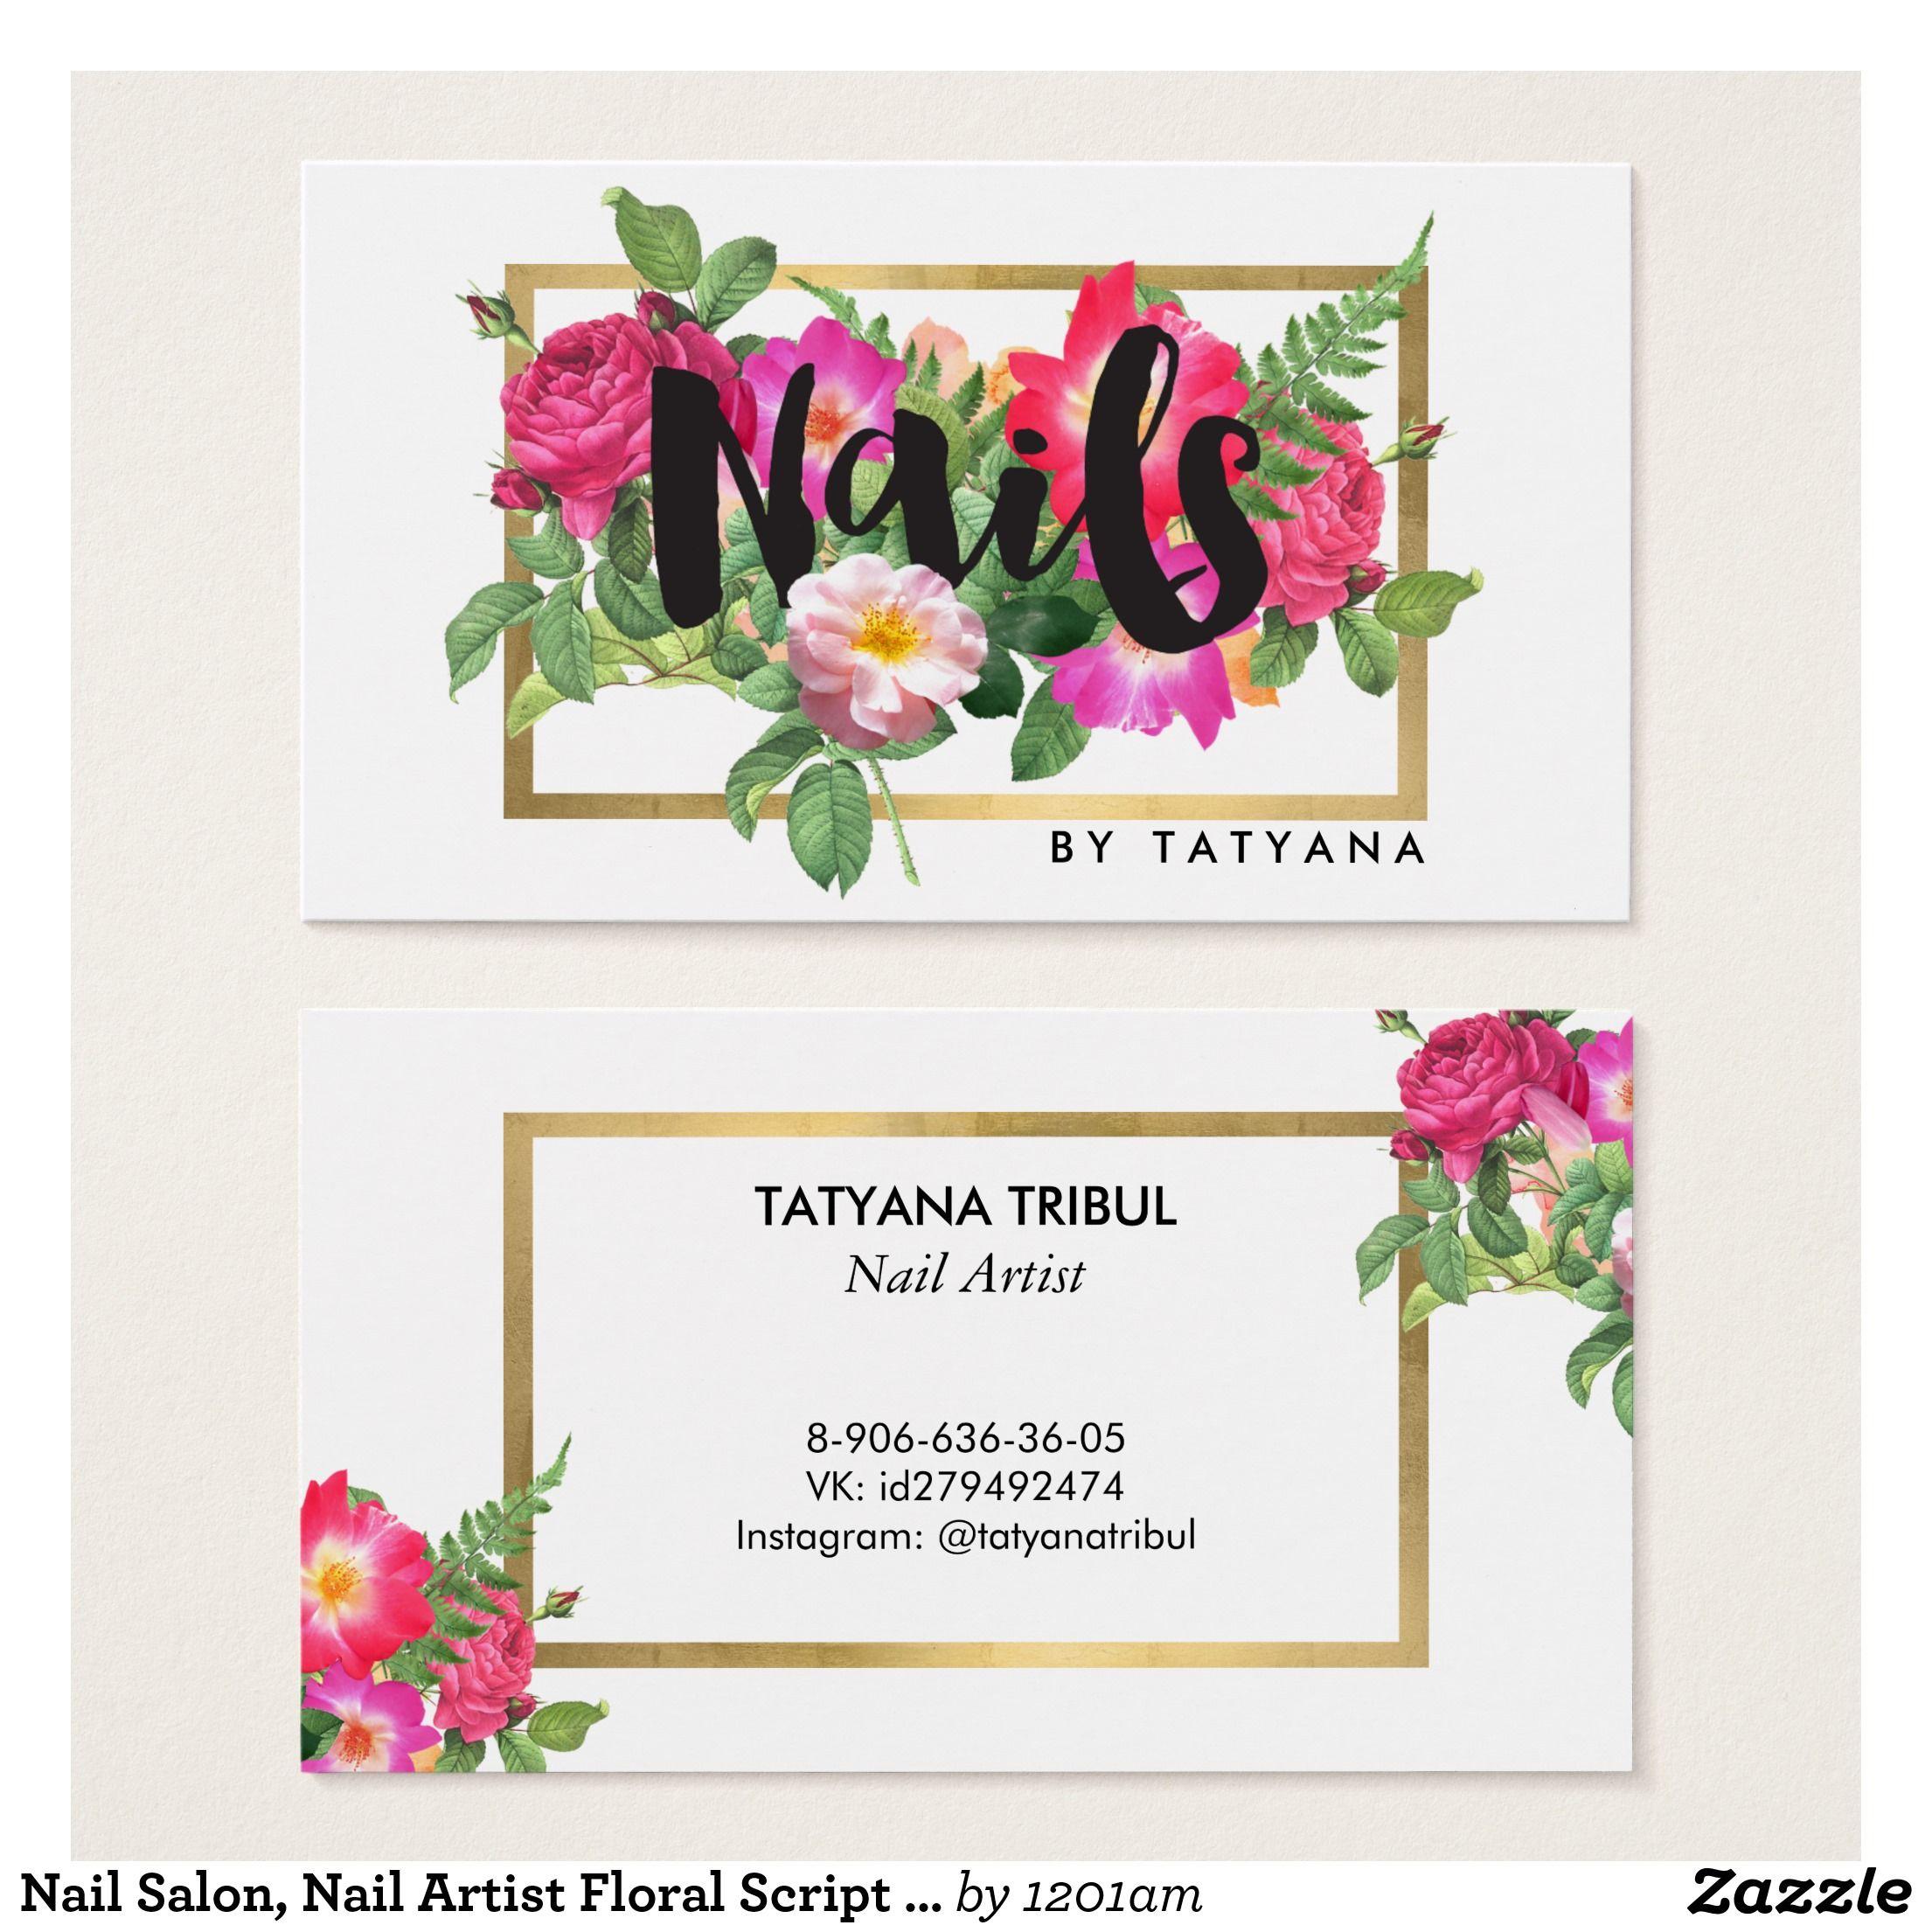 Beauty Florals Nail Salon White Business Card | Salon nails, Nail ...